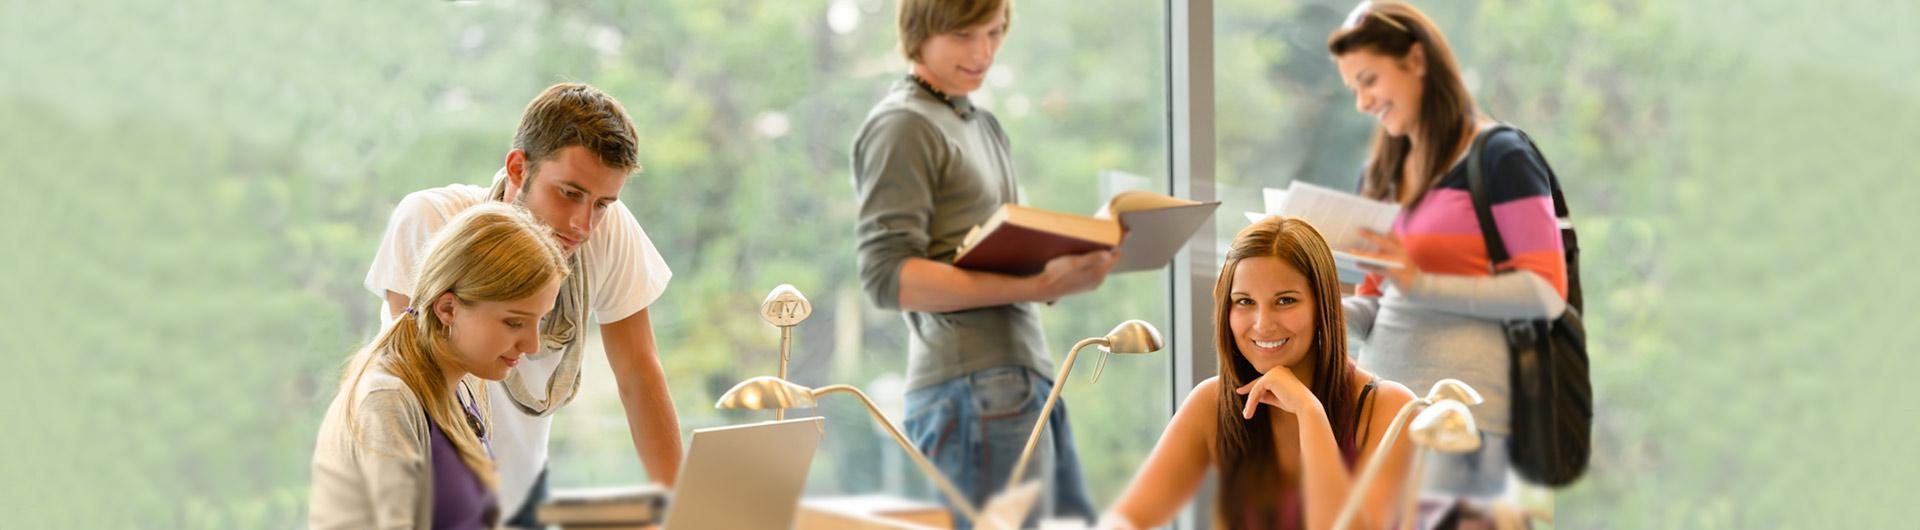 How To Buy Essays Online